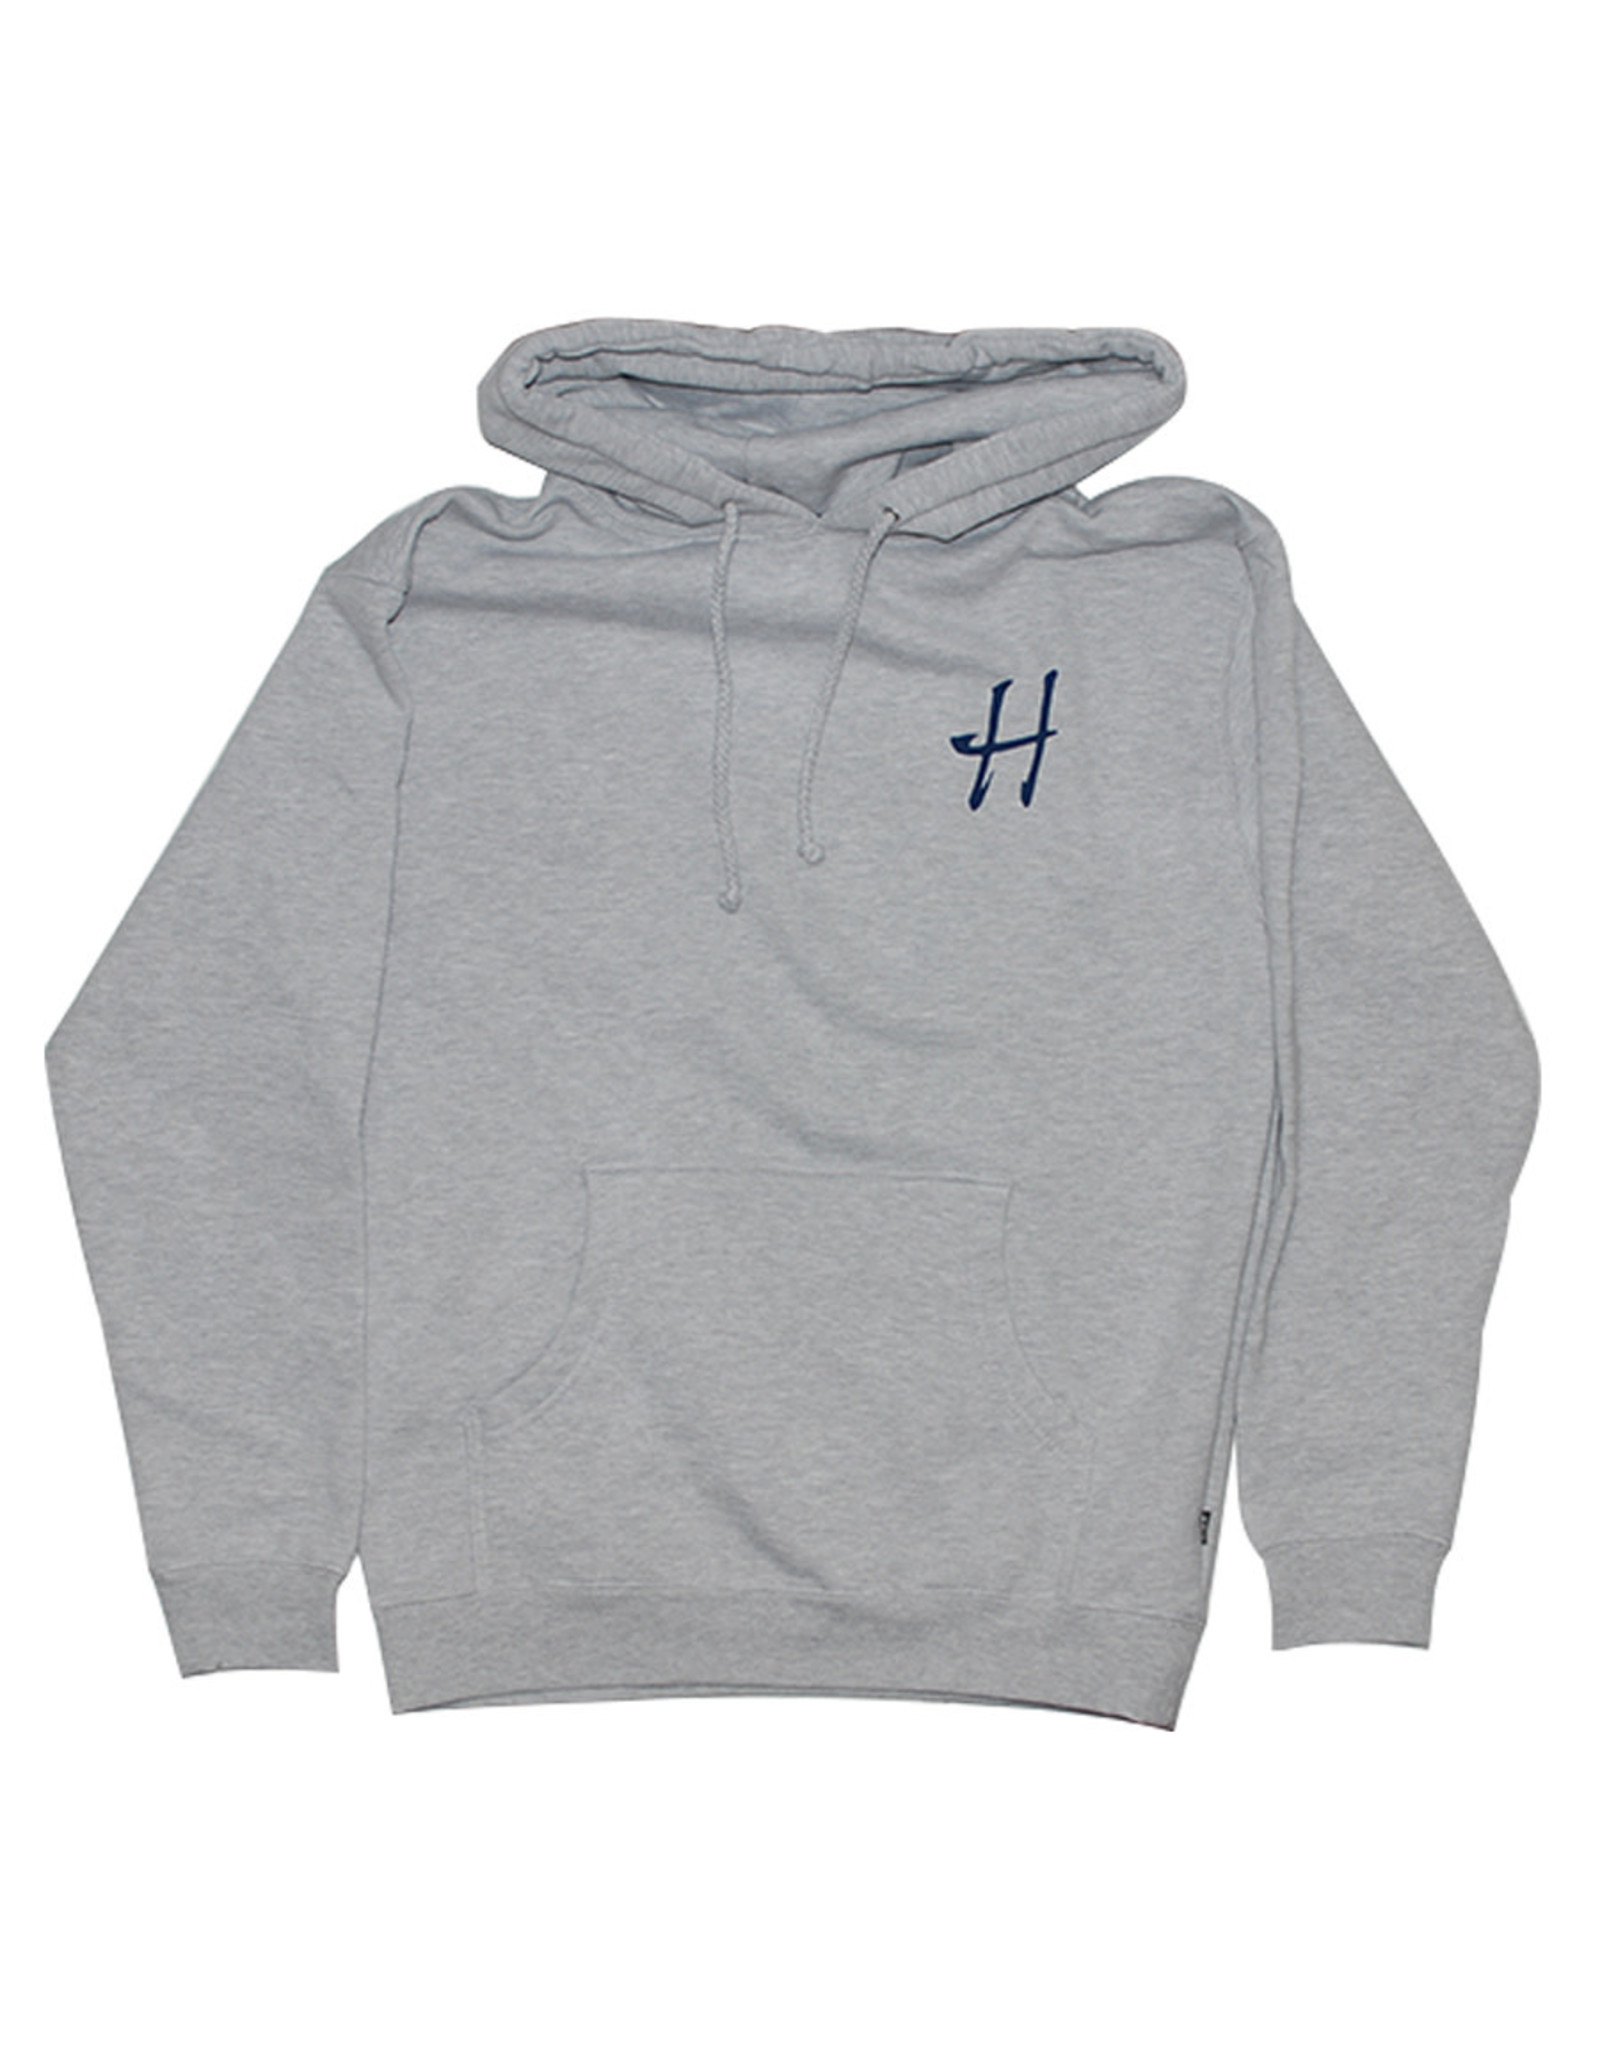 Huf Huf Hood X James Jarvis Pullover (Grey Heather)